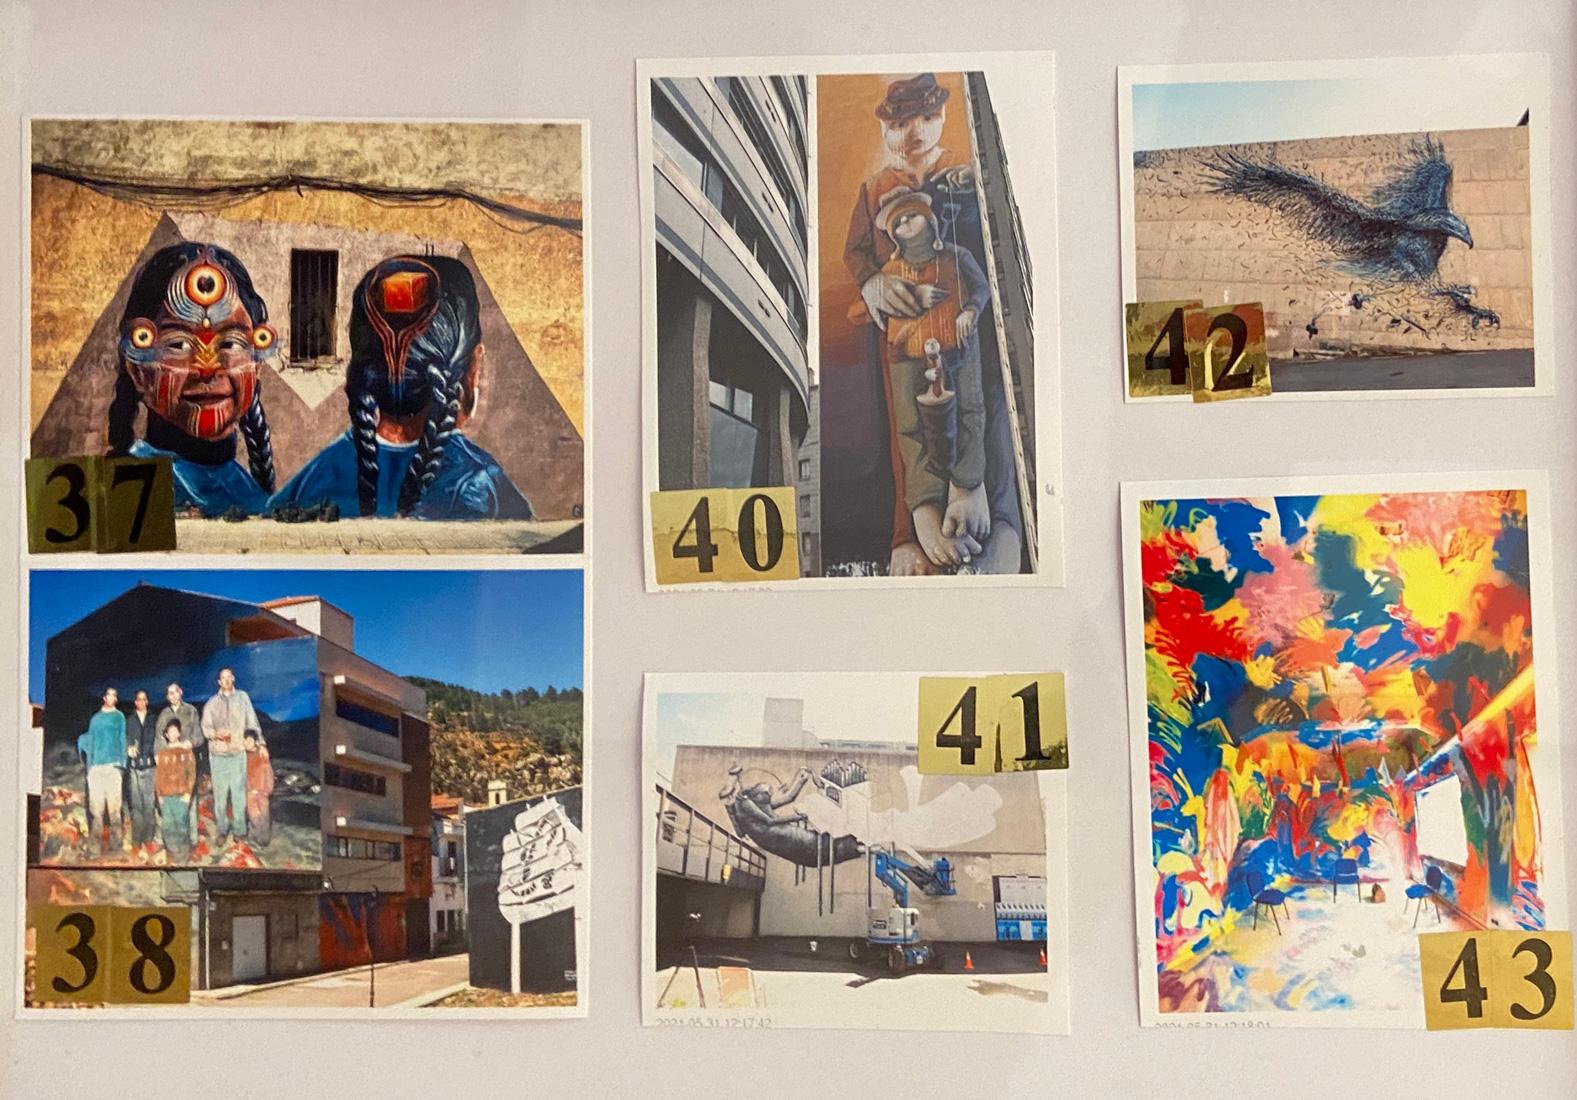 arte urbano exposición de arte contemporáneo en Barcelona